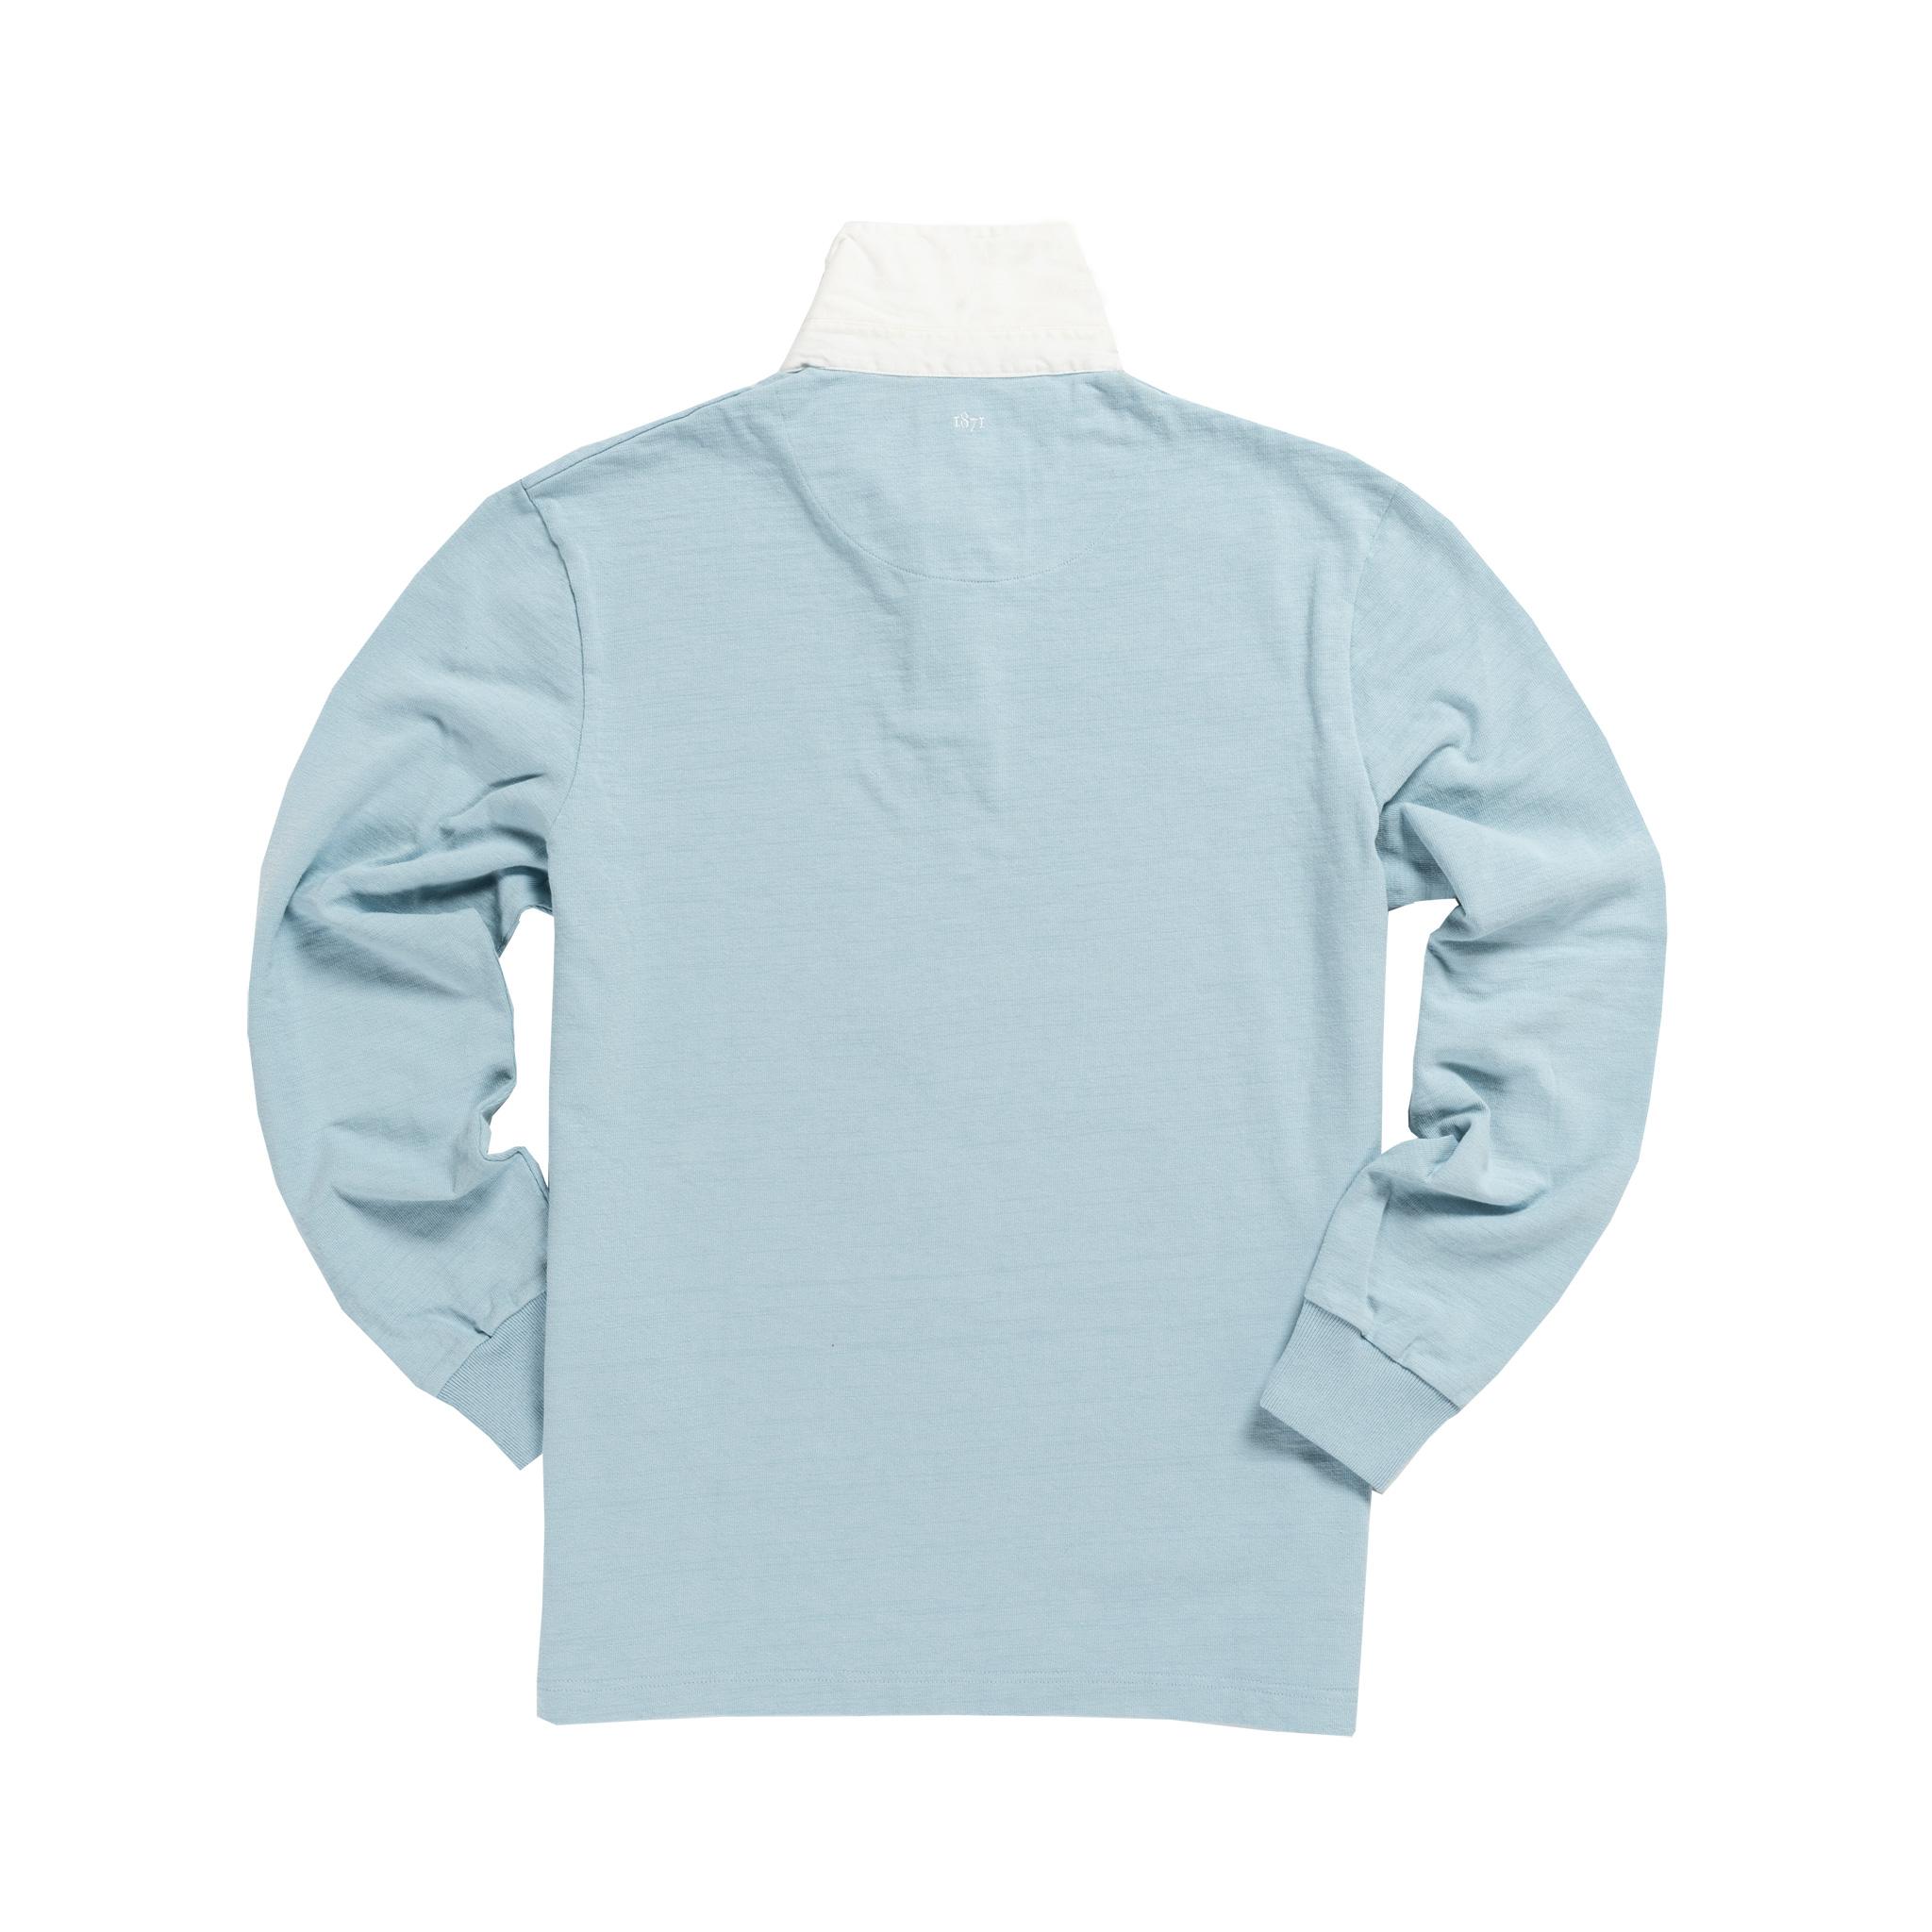 Sherborne 1846 Rugby Shirt_Back